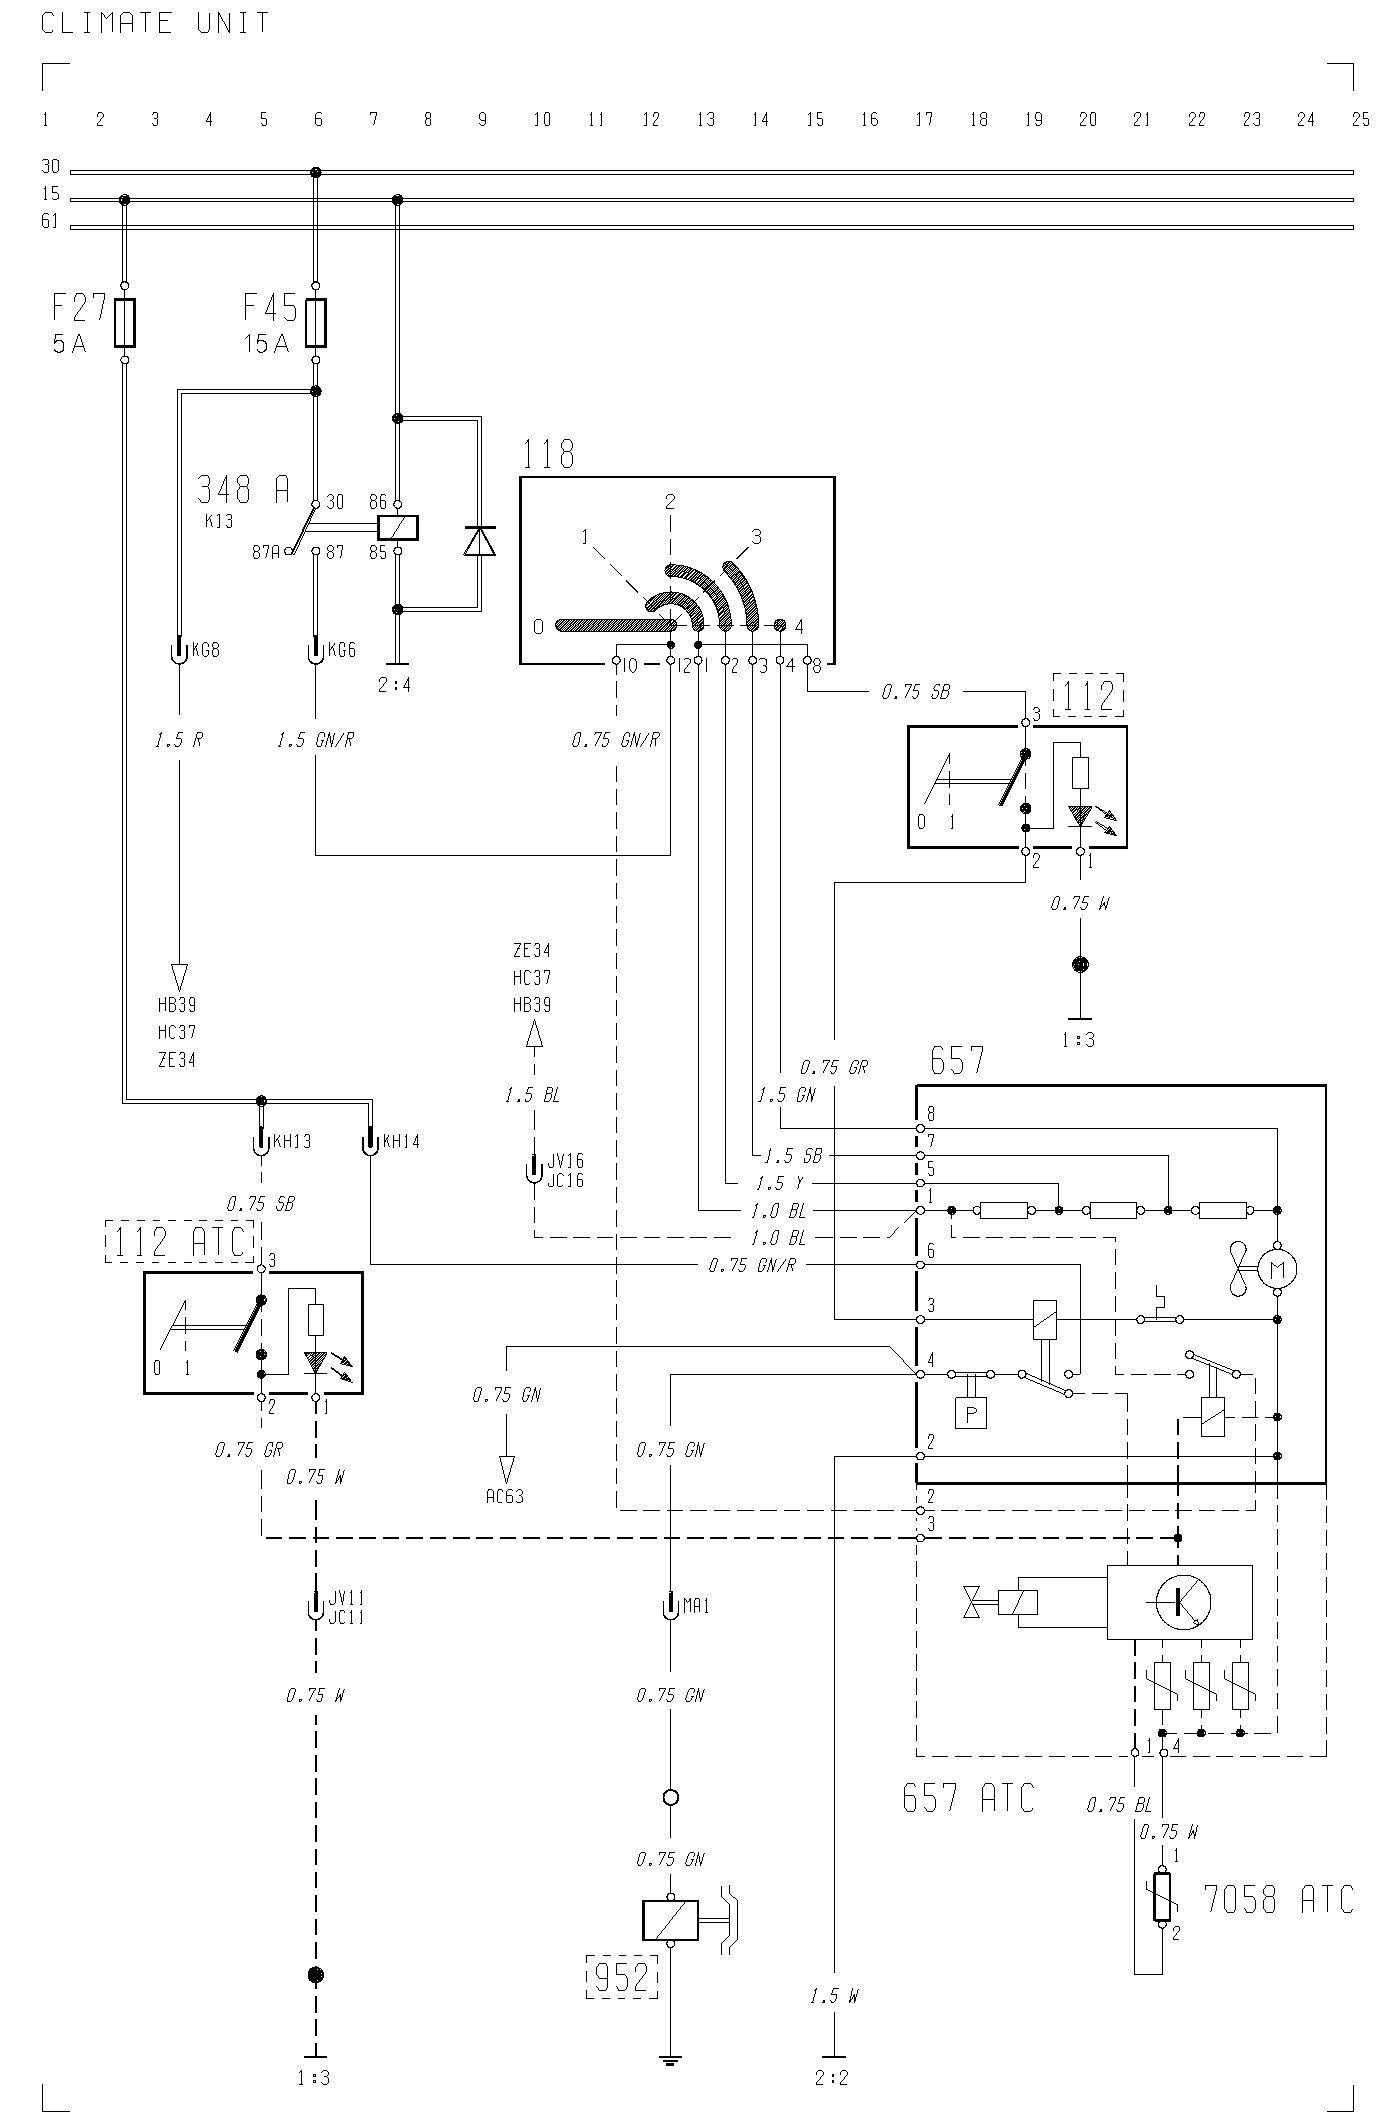 hight resolution of volvo f12 f16 wiring diagram climate unit carknowledge wiring diagram volvo f12